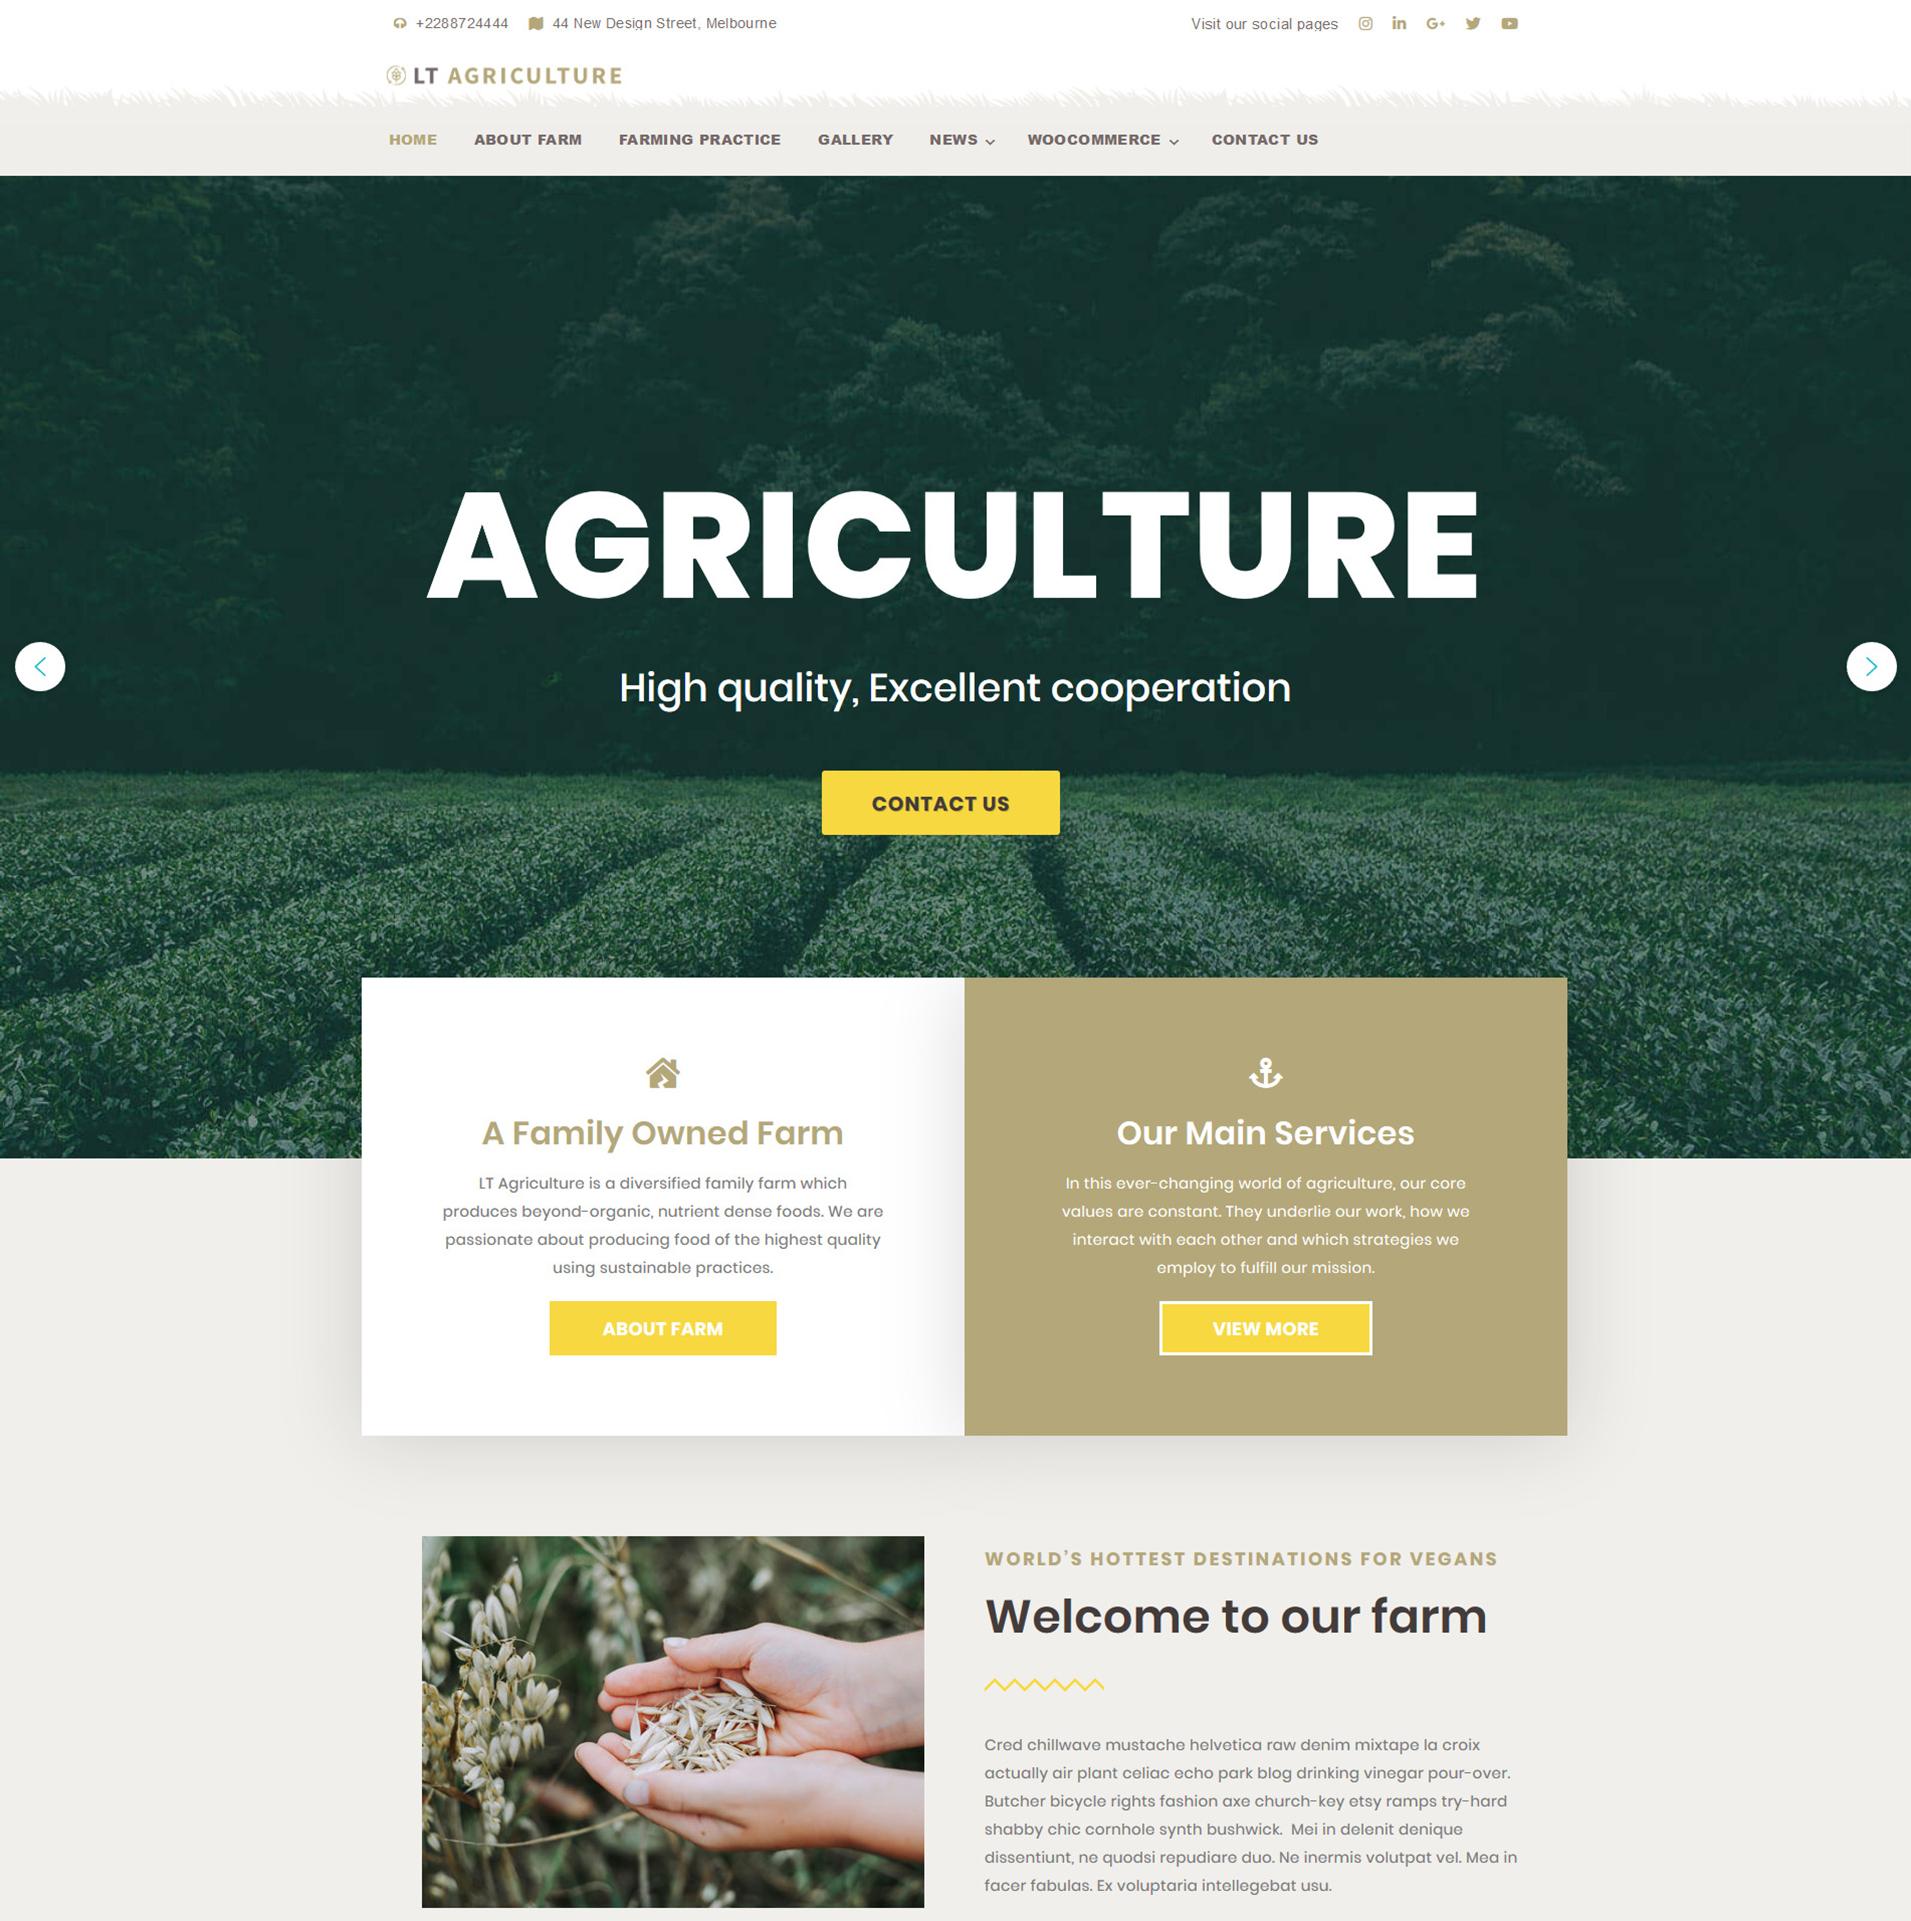 lt-agriculture-wordpress-theme-full